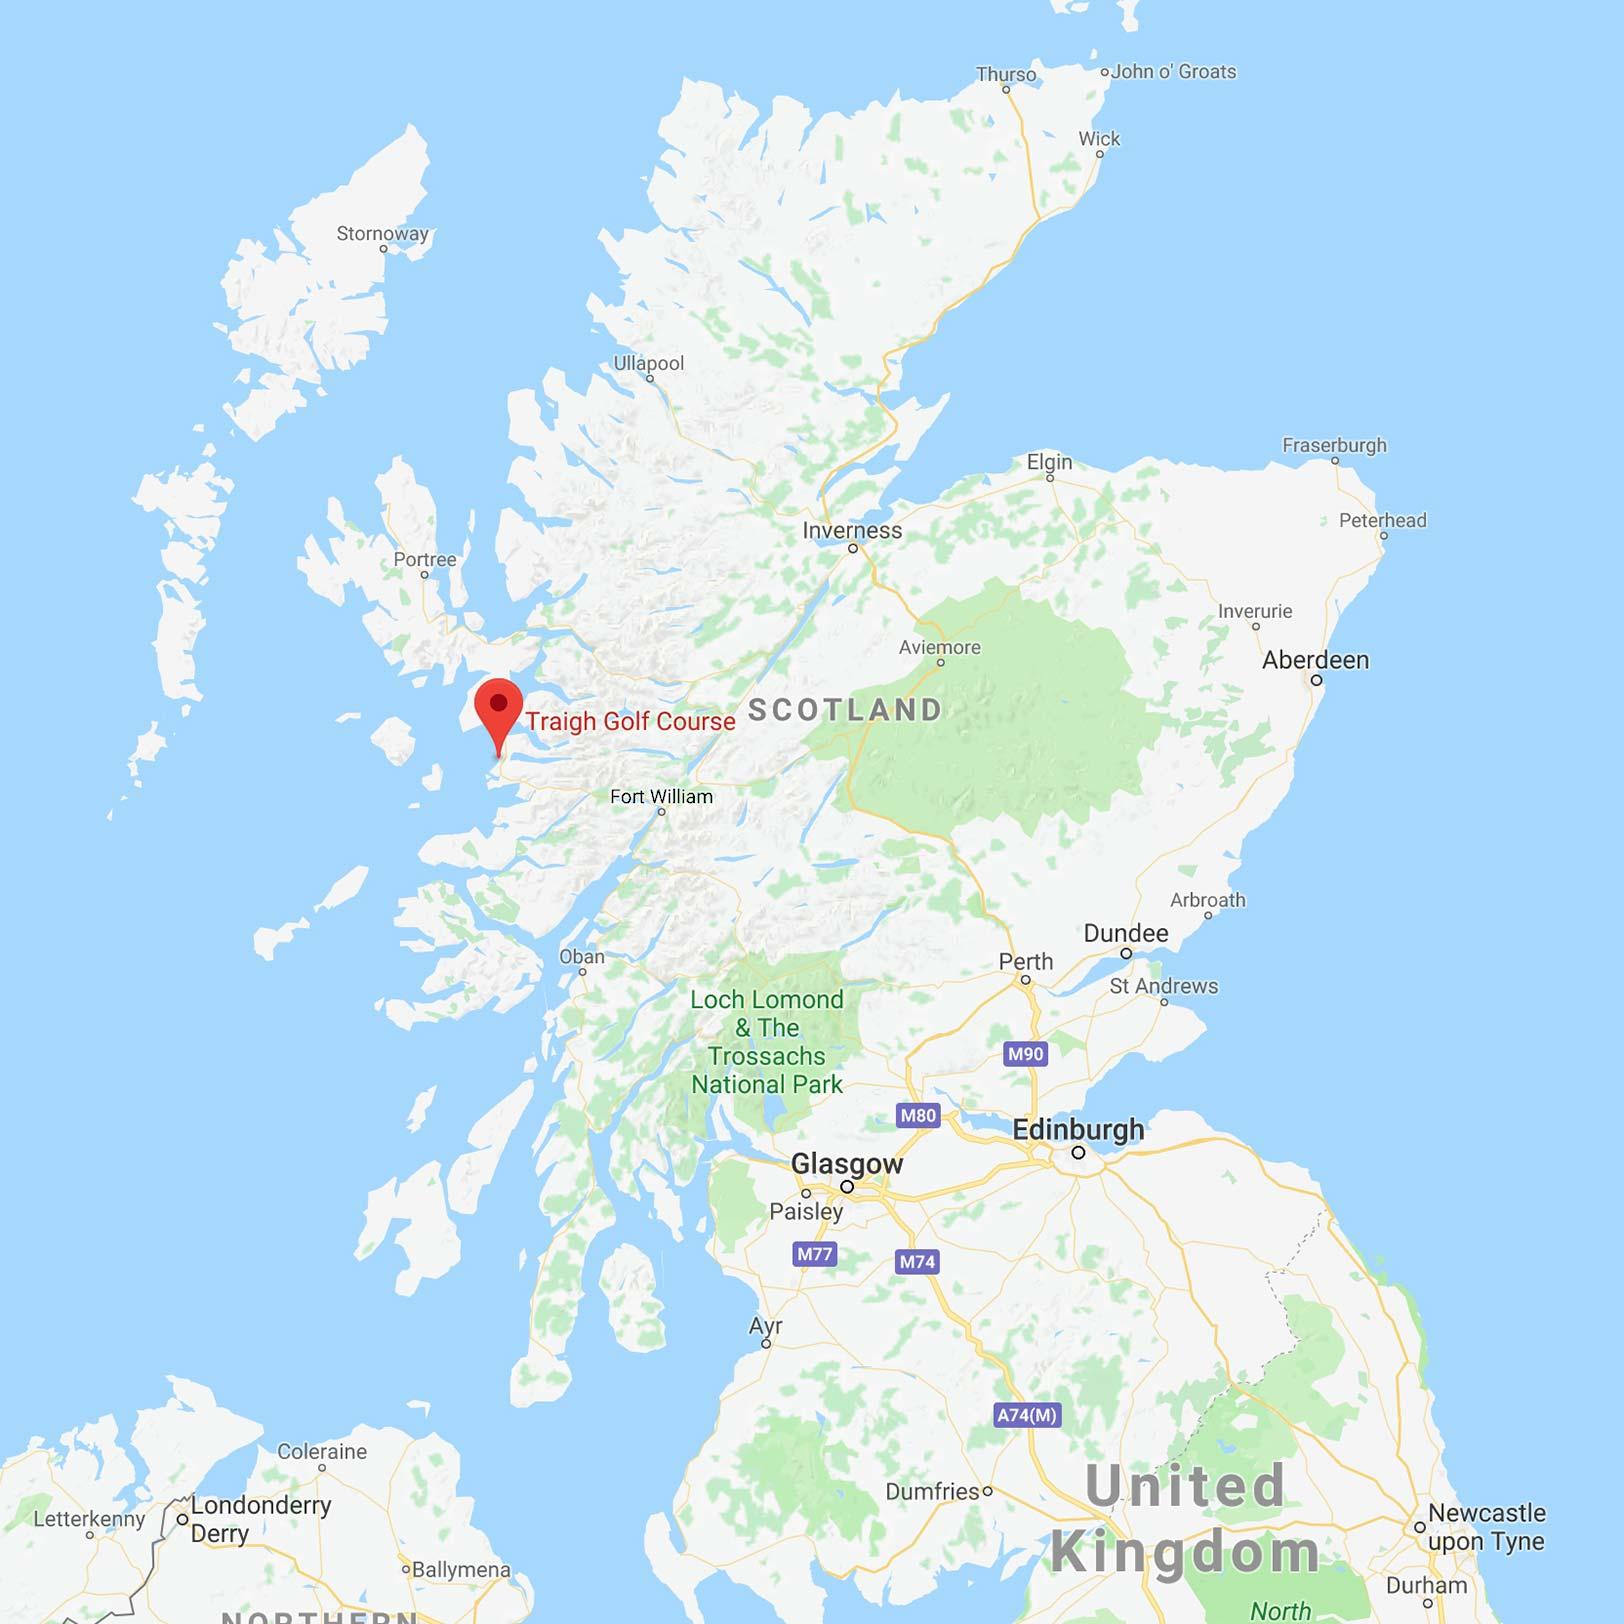 google-map-of-scotland_w1624.jpg